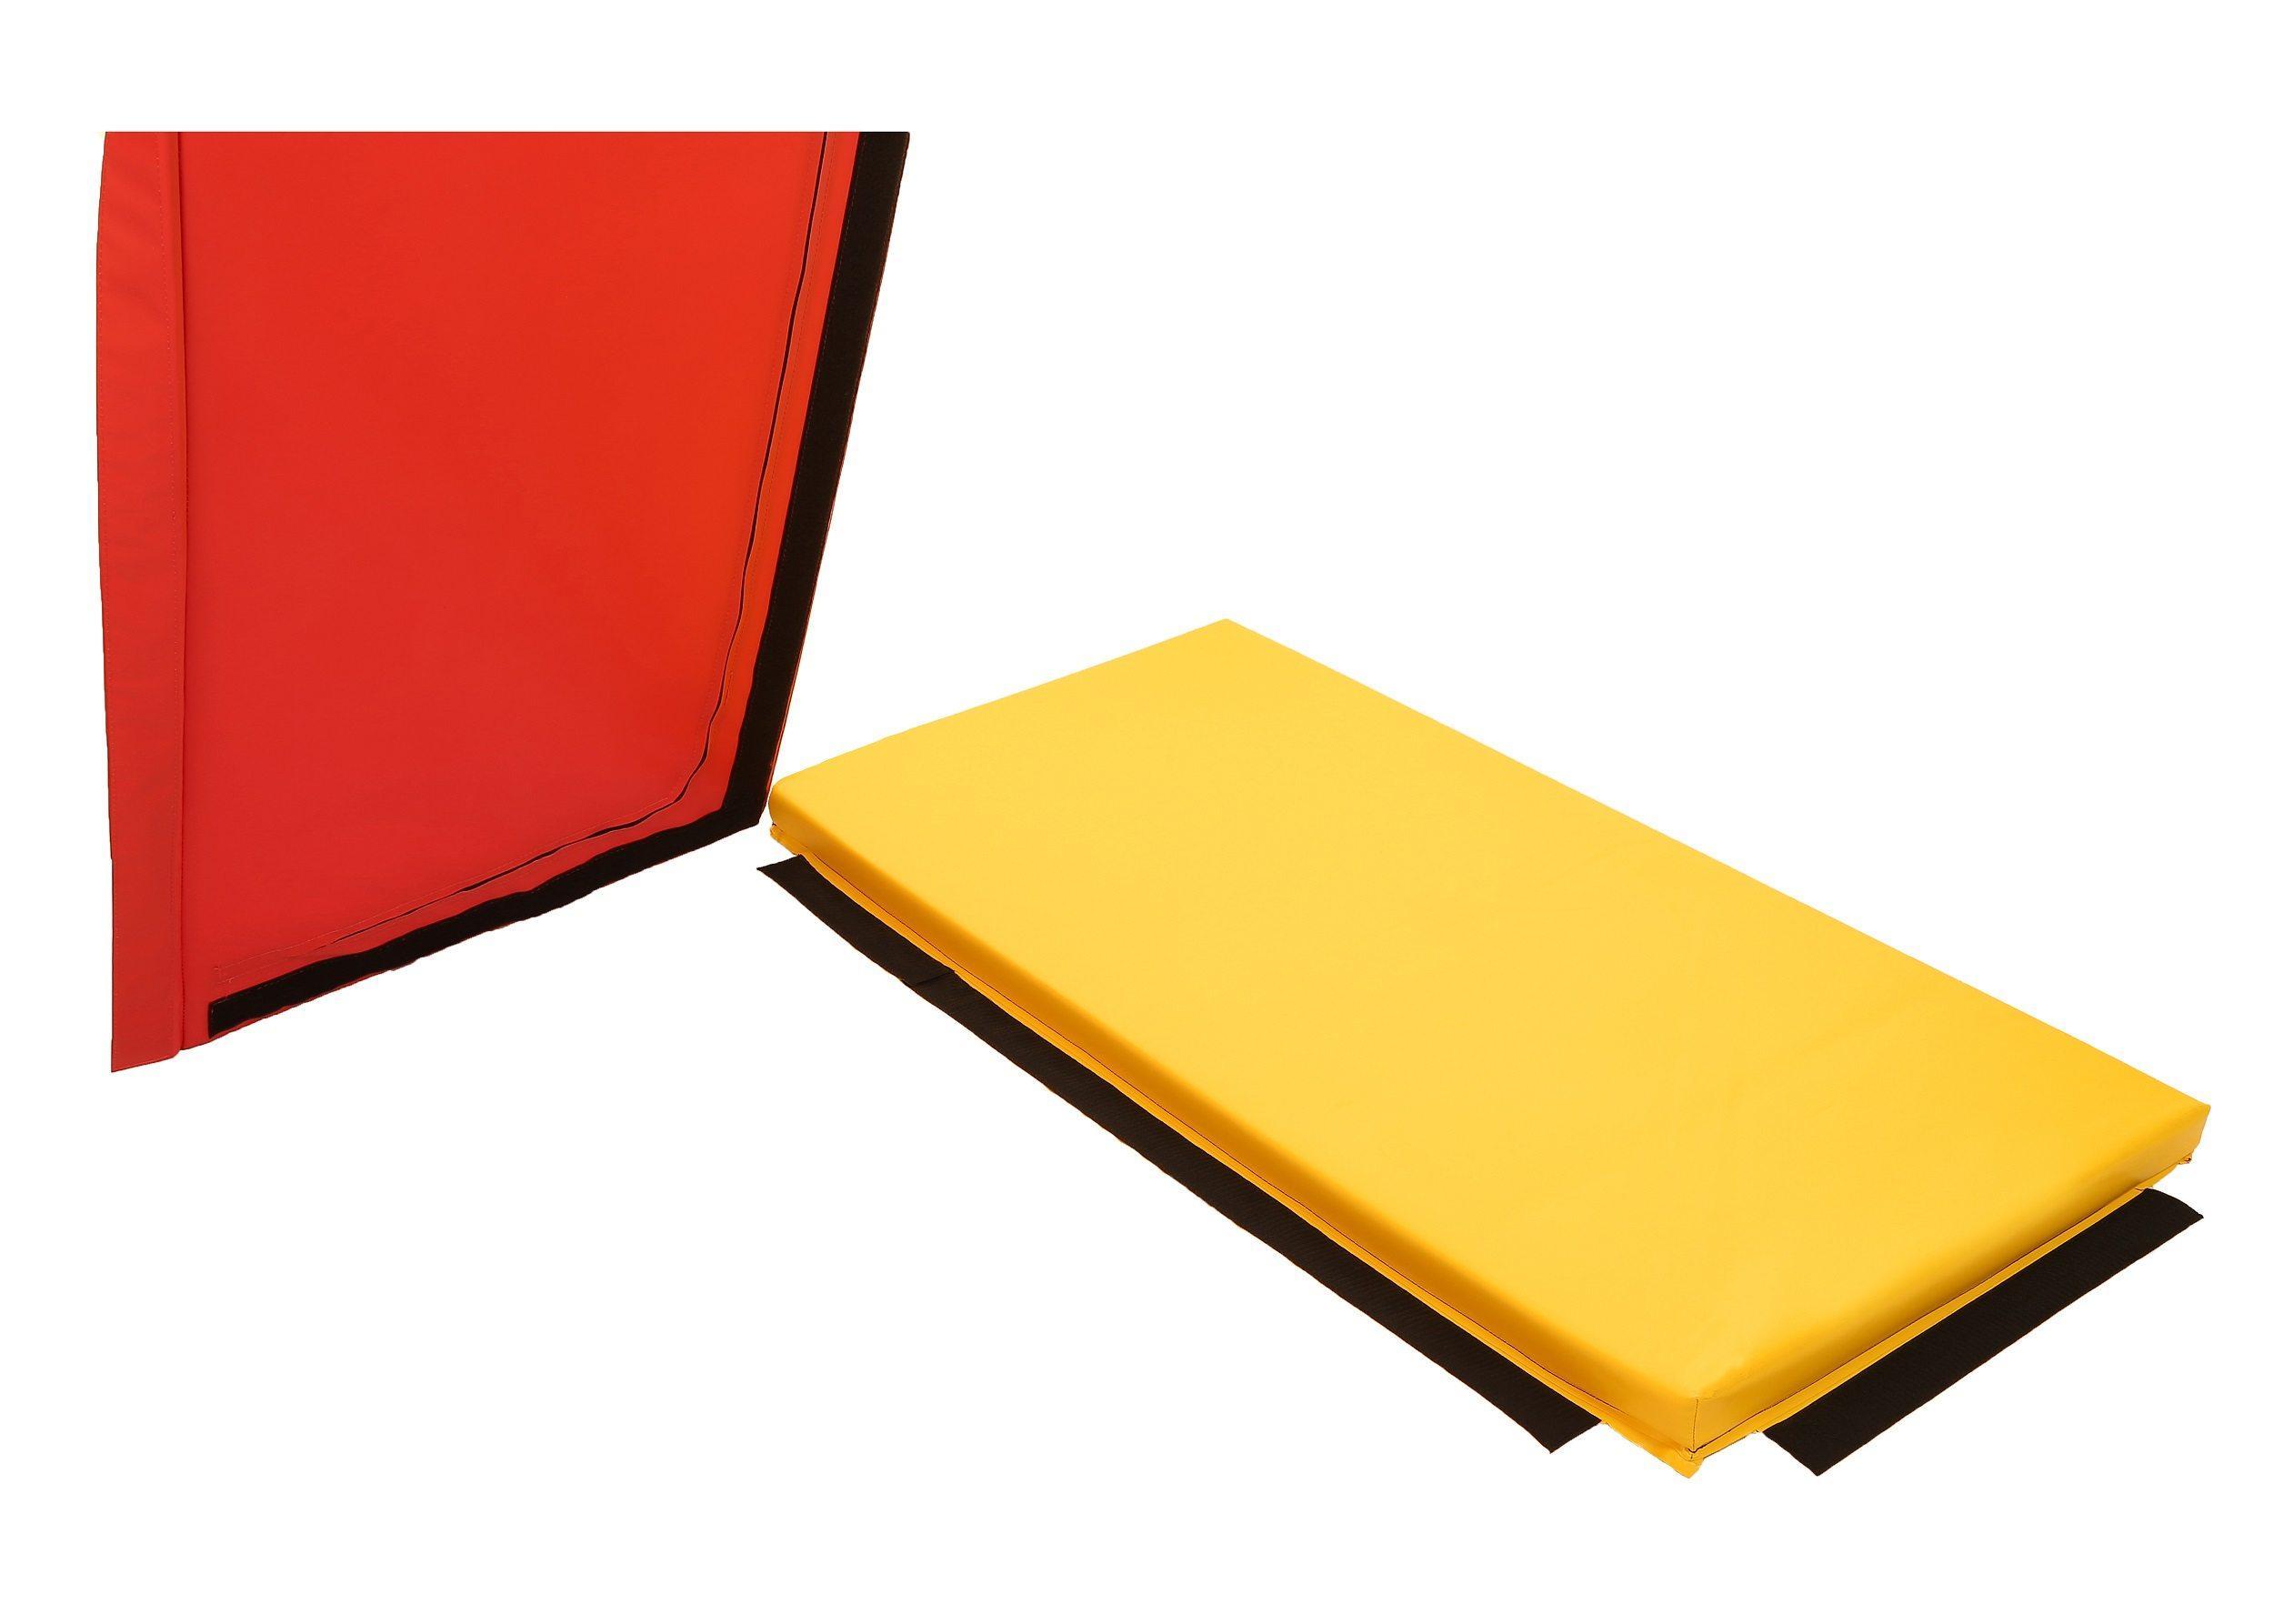 pe and dav gym education spt medium red sport dance mat hope weight product gymnastic mats gymnastics